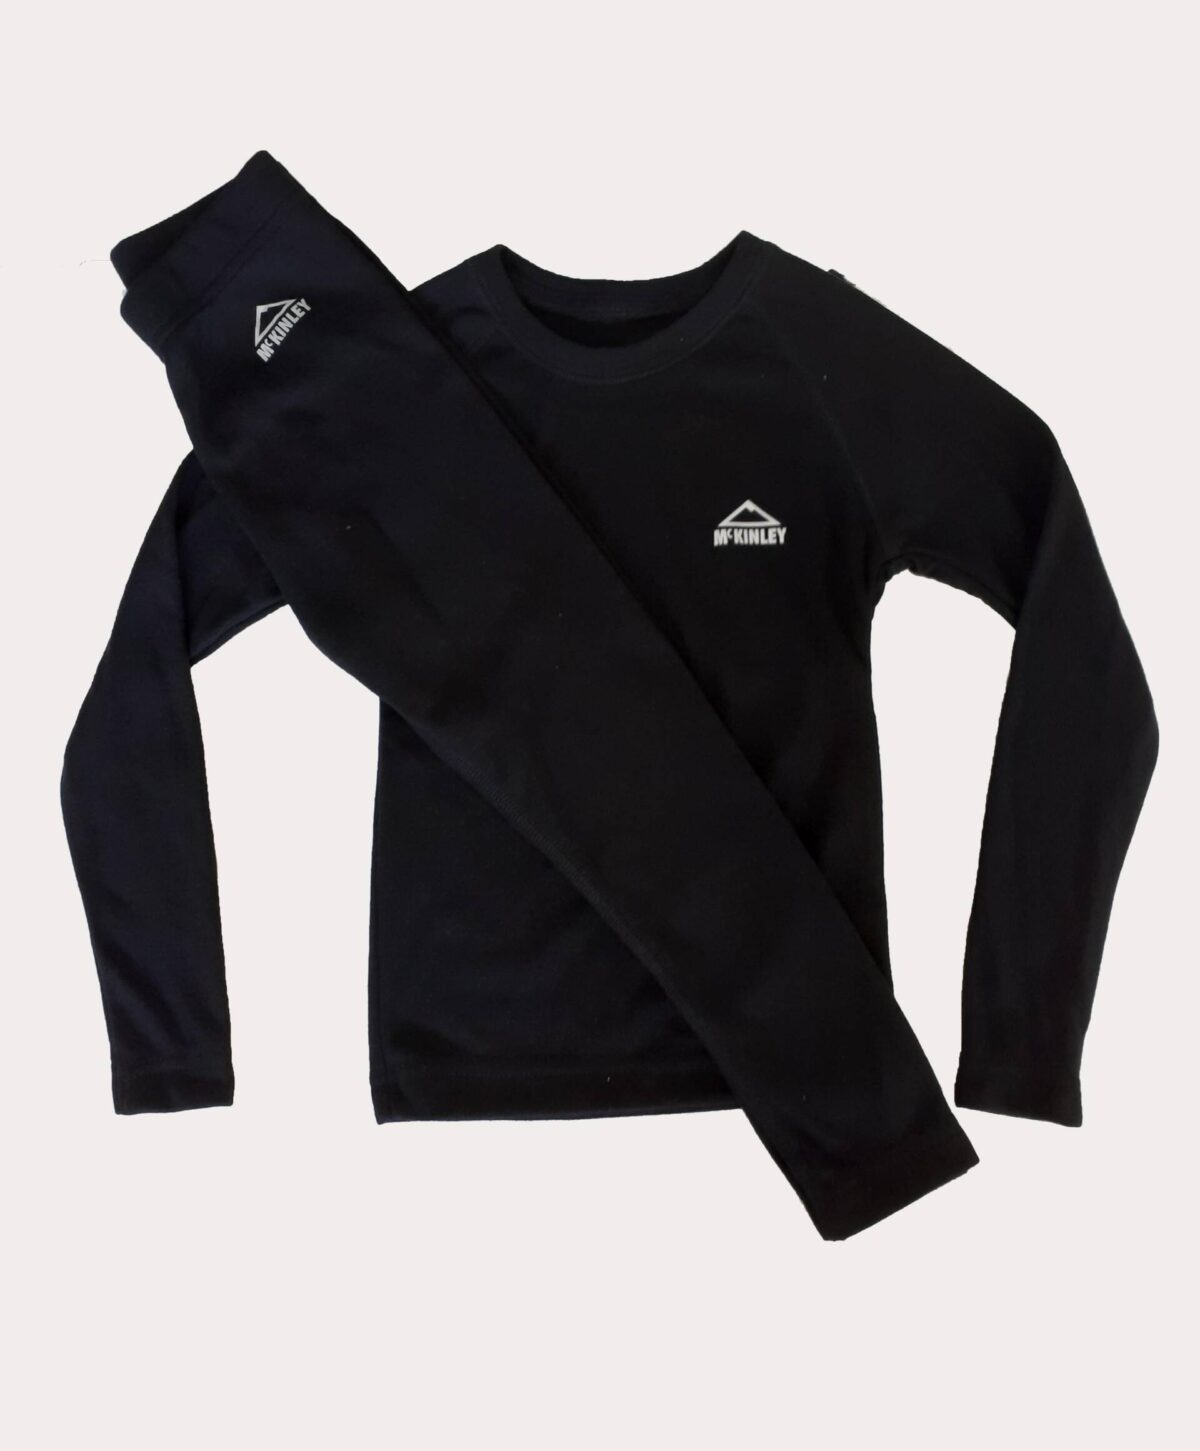 Photo of black McKinley sports underwear: long-sleeved top and long leggings.